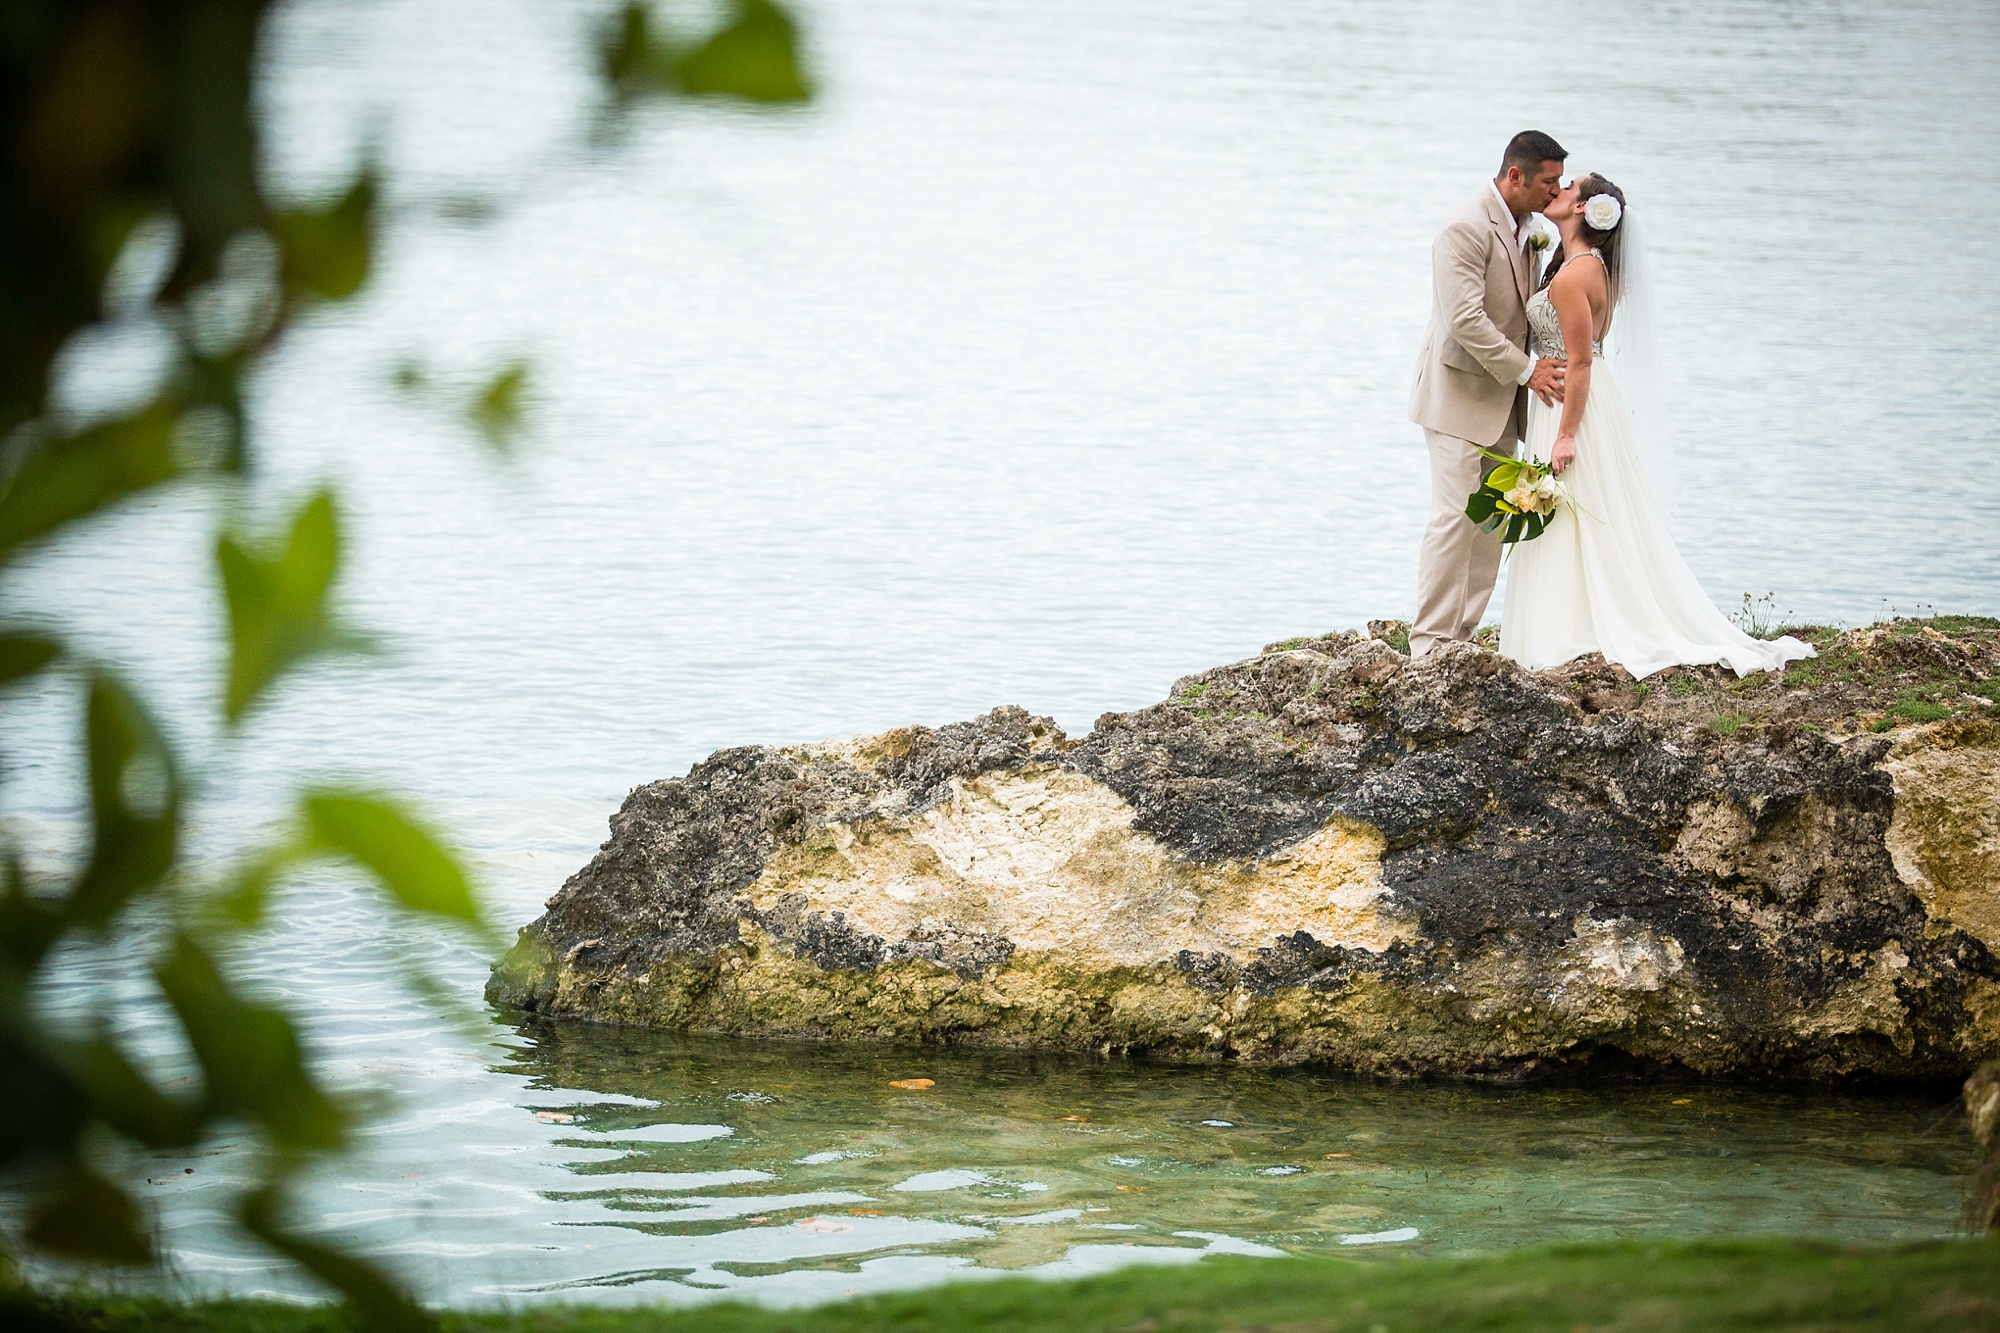 Brandon_Shafer_Photography_Scott_Marisa_Negril_Jamaica_Destination_Wedding_Photography_0044.jpg